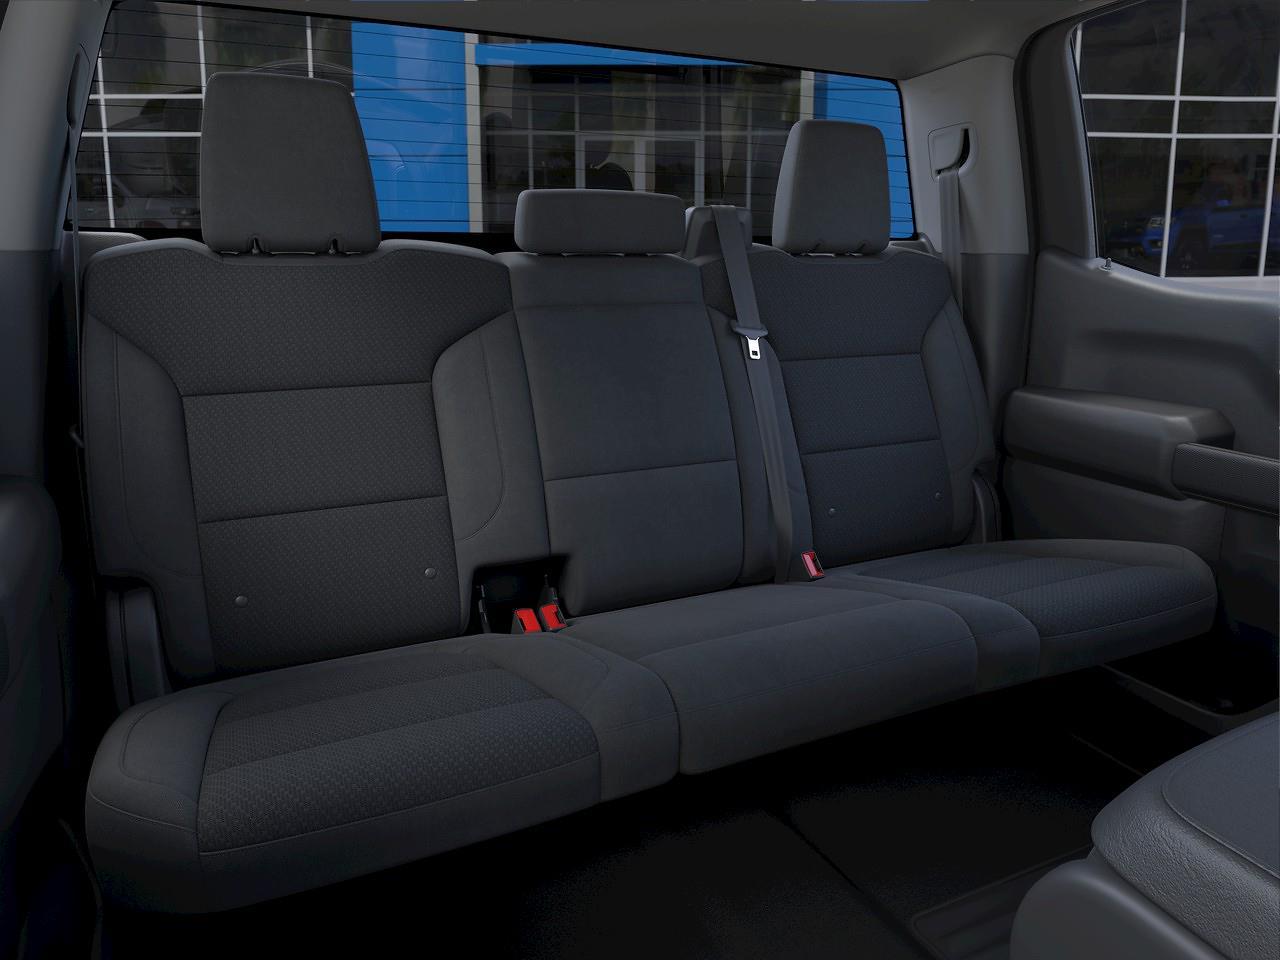 2021 Chevrolet Silverado 1500 Crew Cab 4x4, Pickup #Q210444 - photo 14